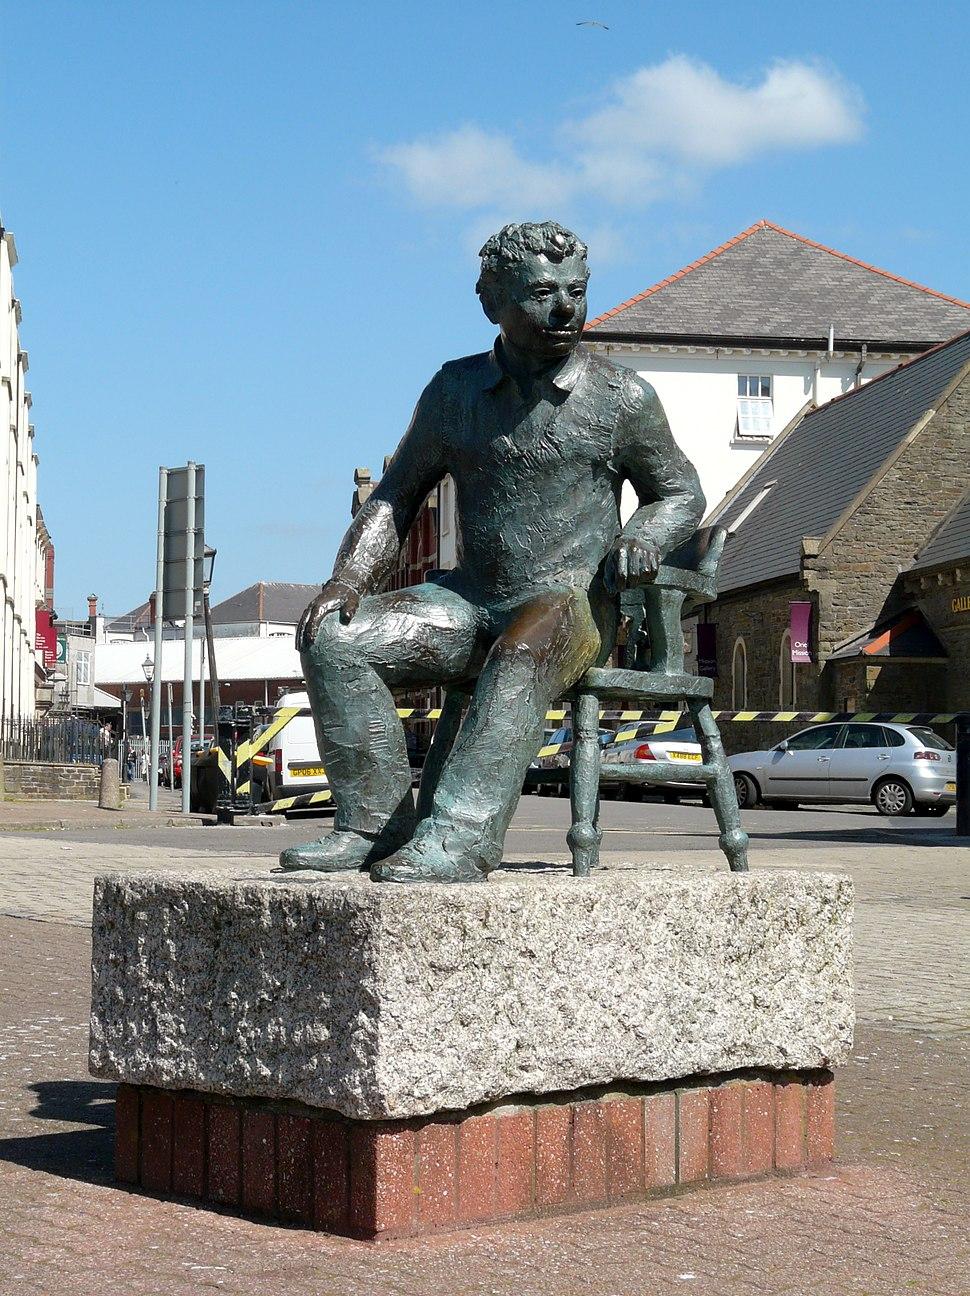 Statue of Dylan Thomas, Swansea